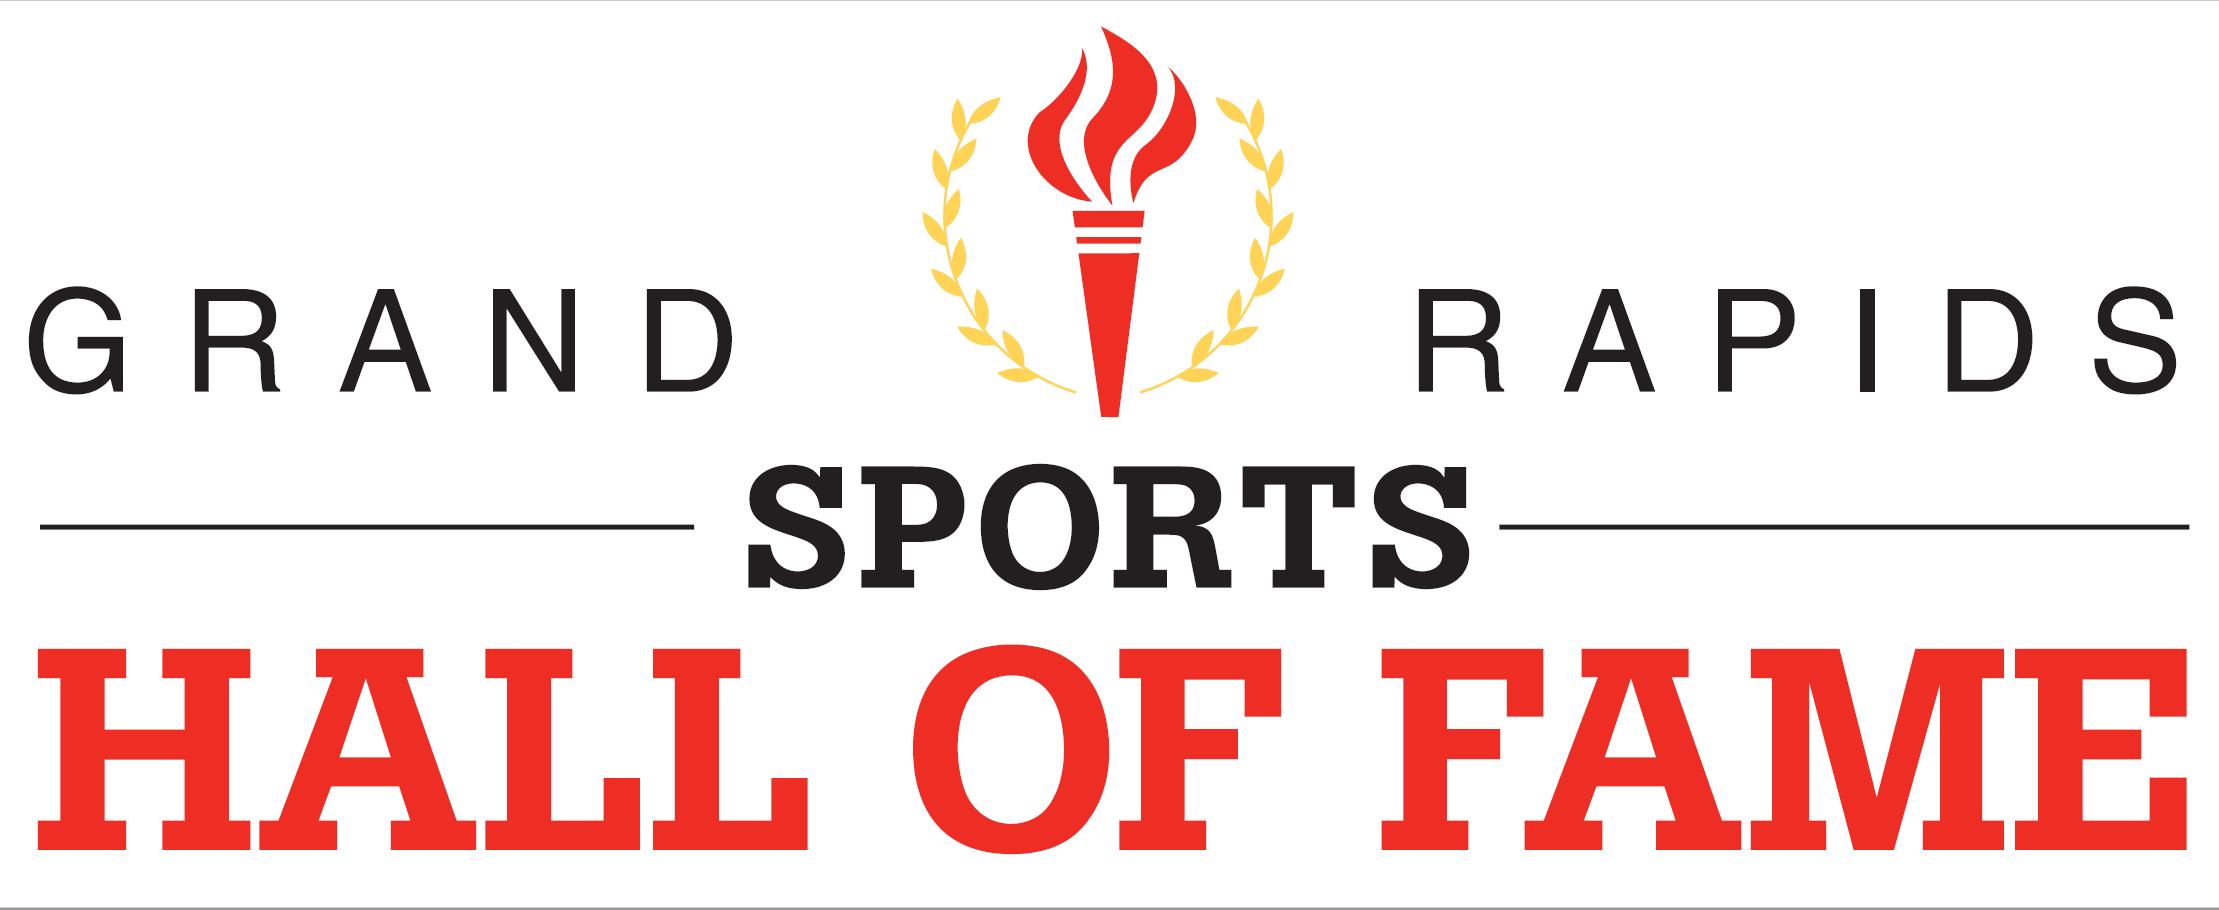 Grand Rapids Sports Hall of Fame